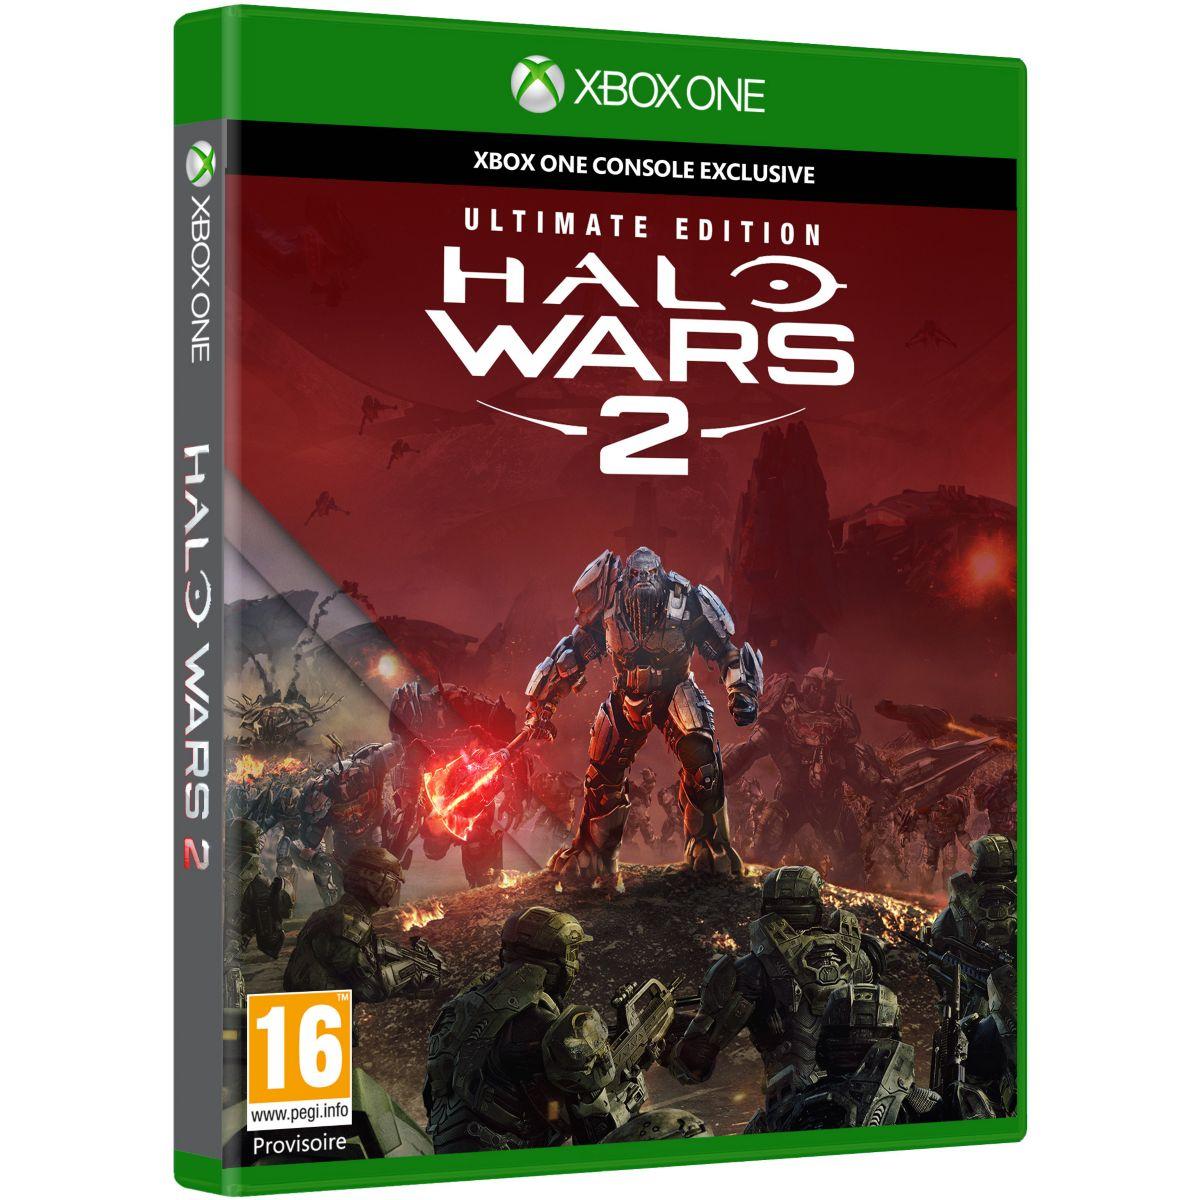 Jeu Xbox One MICROSOFT Halo Wars 2 Ultimate Edition